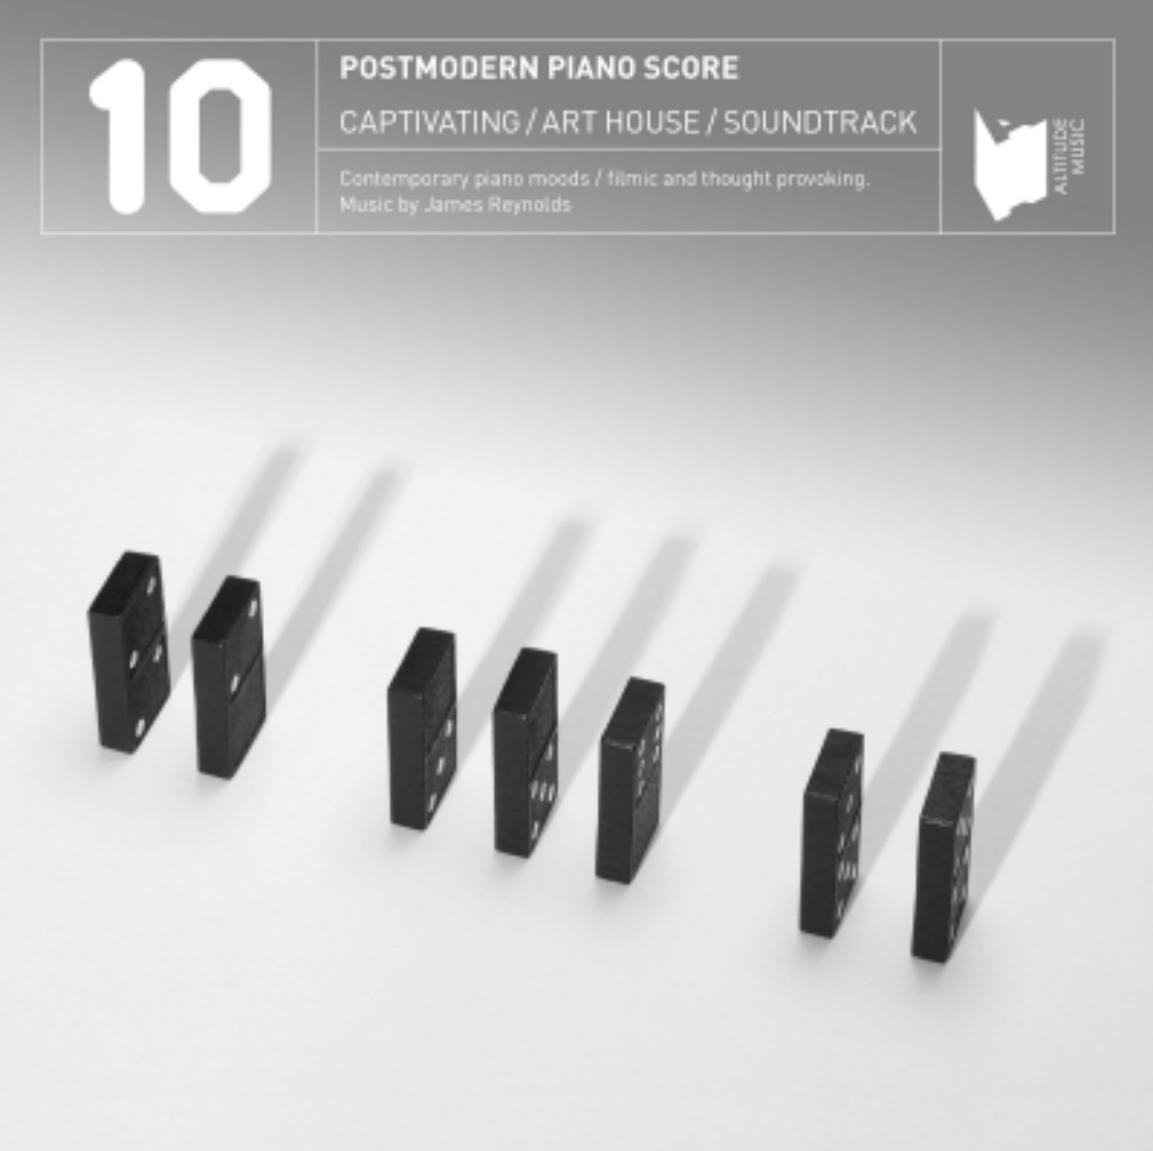 james rey postmodern piano score.PNG